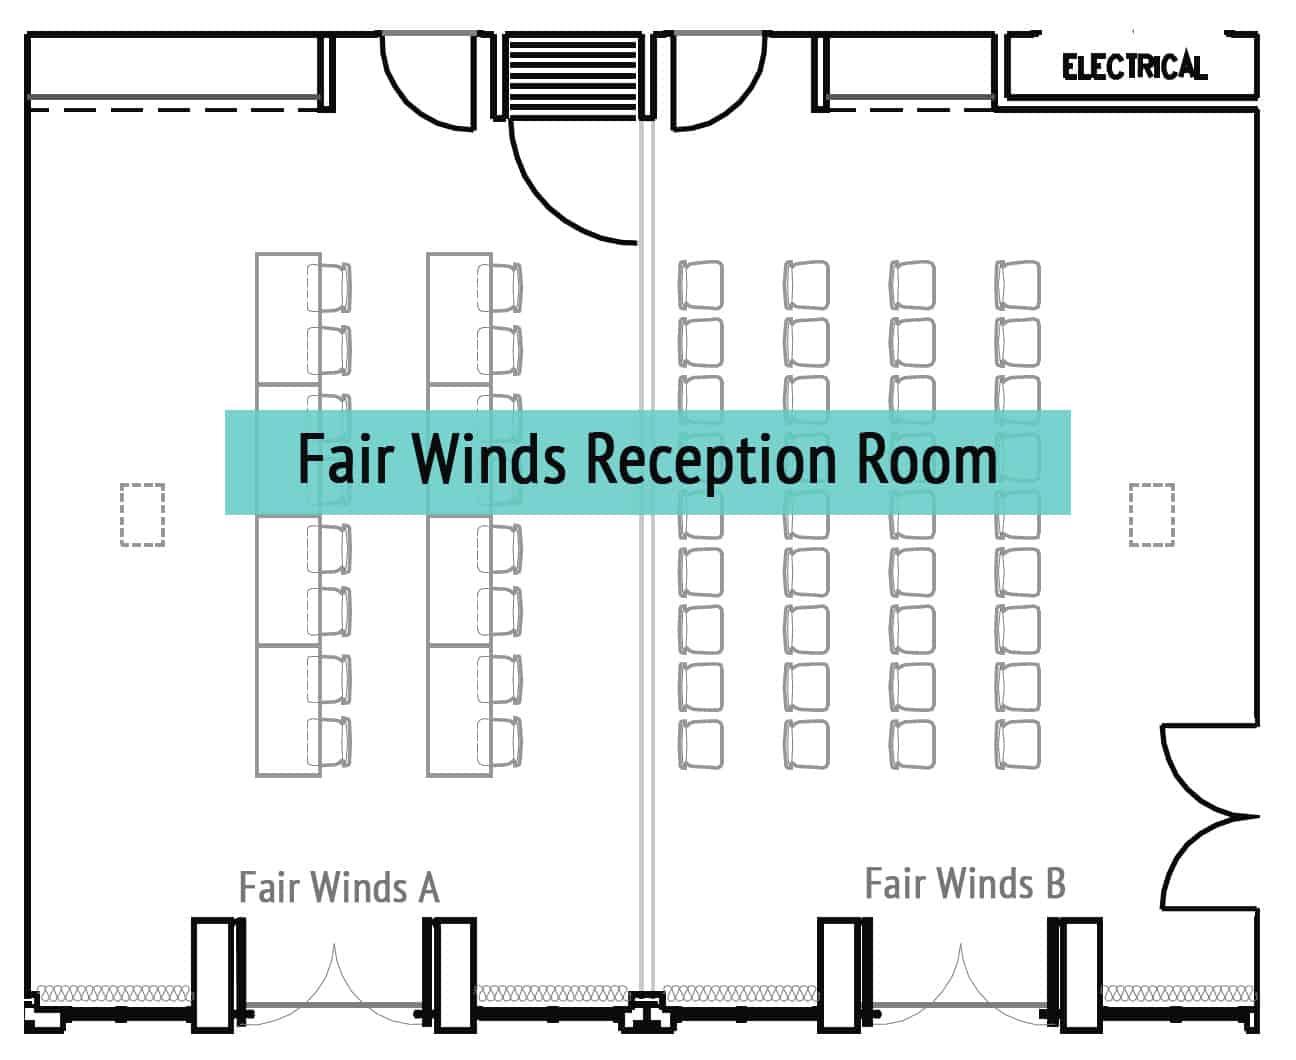 Fair Winds Reception Room